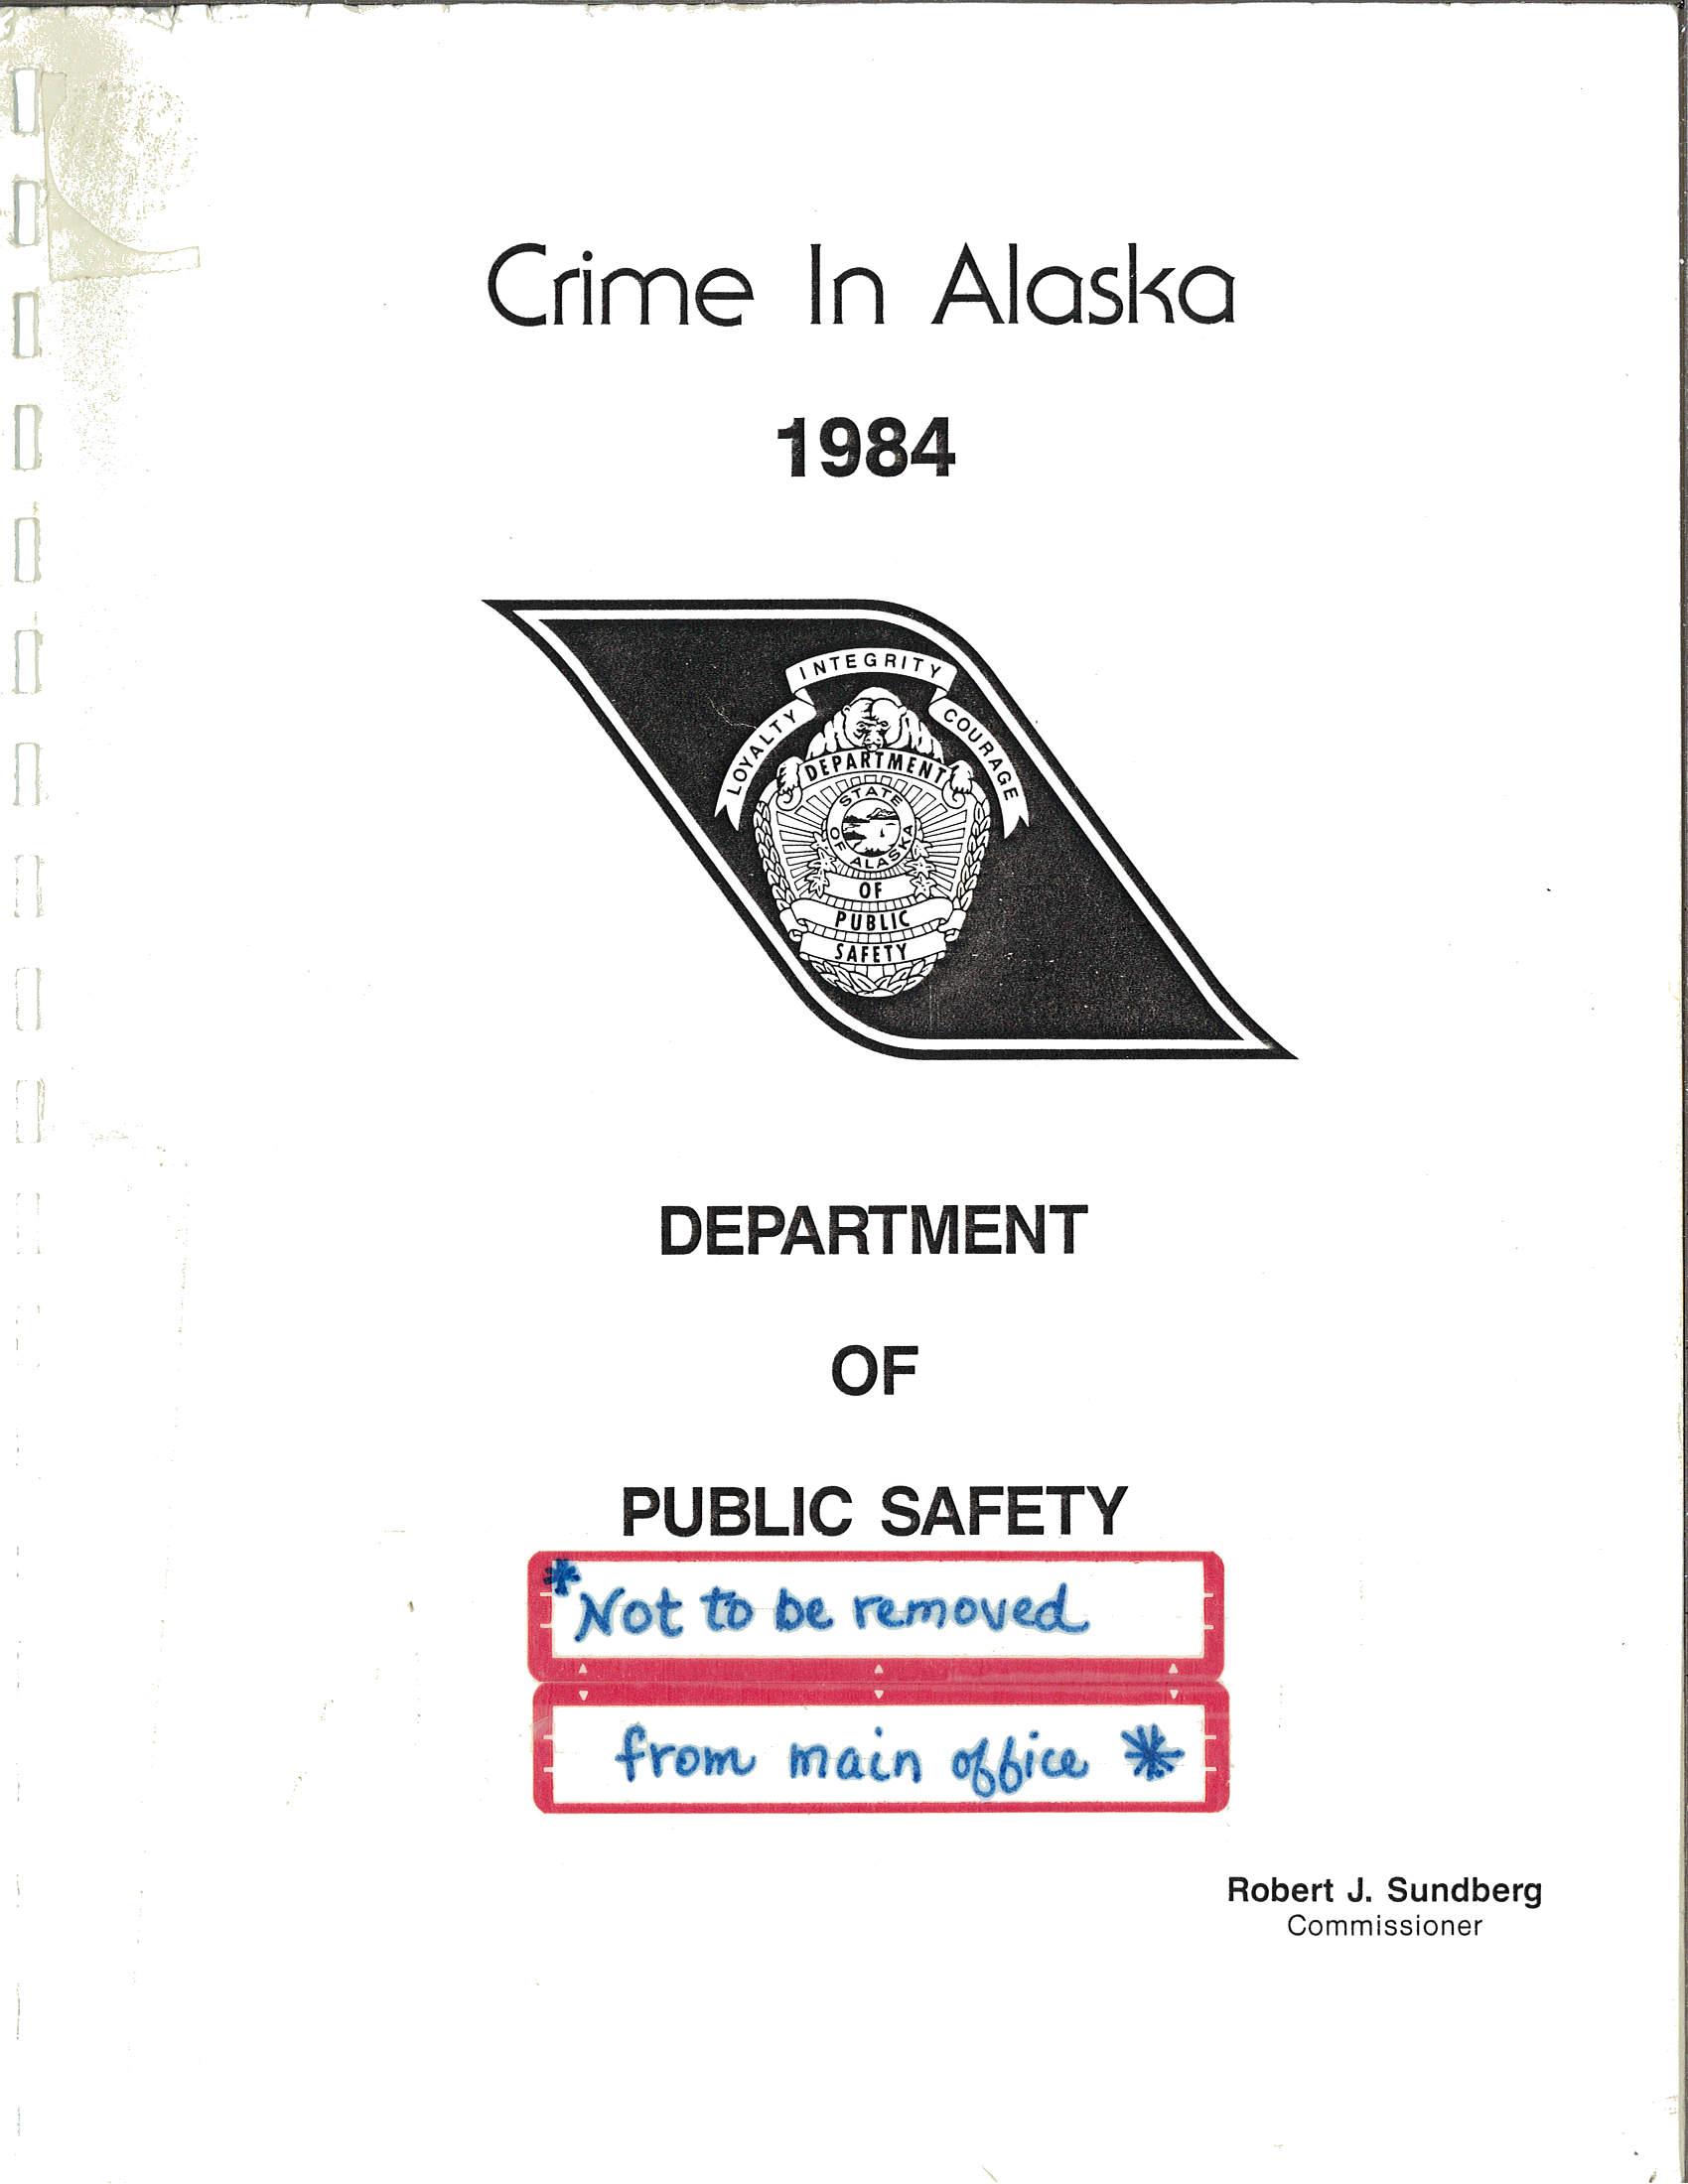 uniform crime report ucr essay Uniform crime reporting (ucr) program data: arson 2001-2016 ann arbor, mi:  inter-university consortium for political and social research.